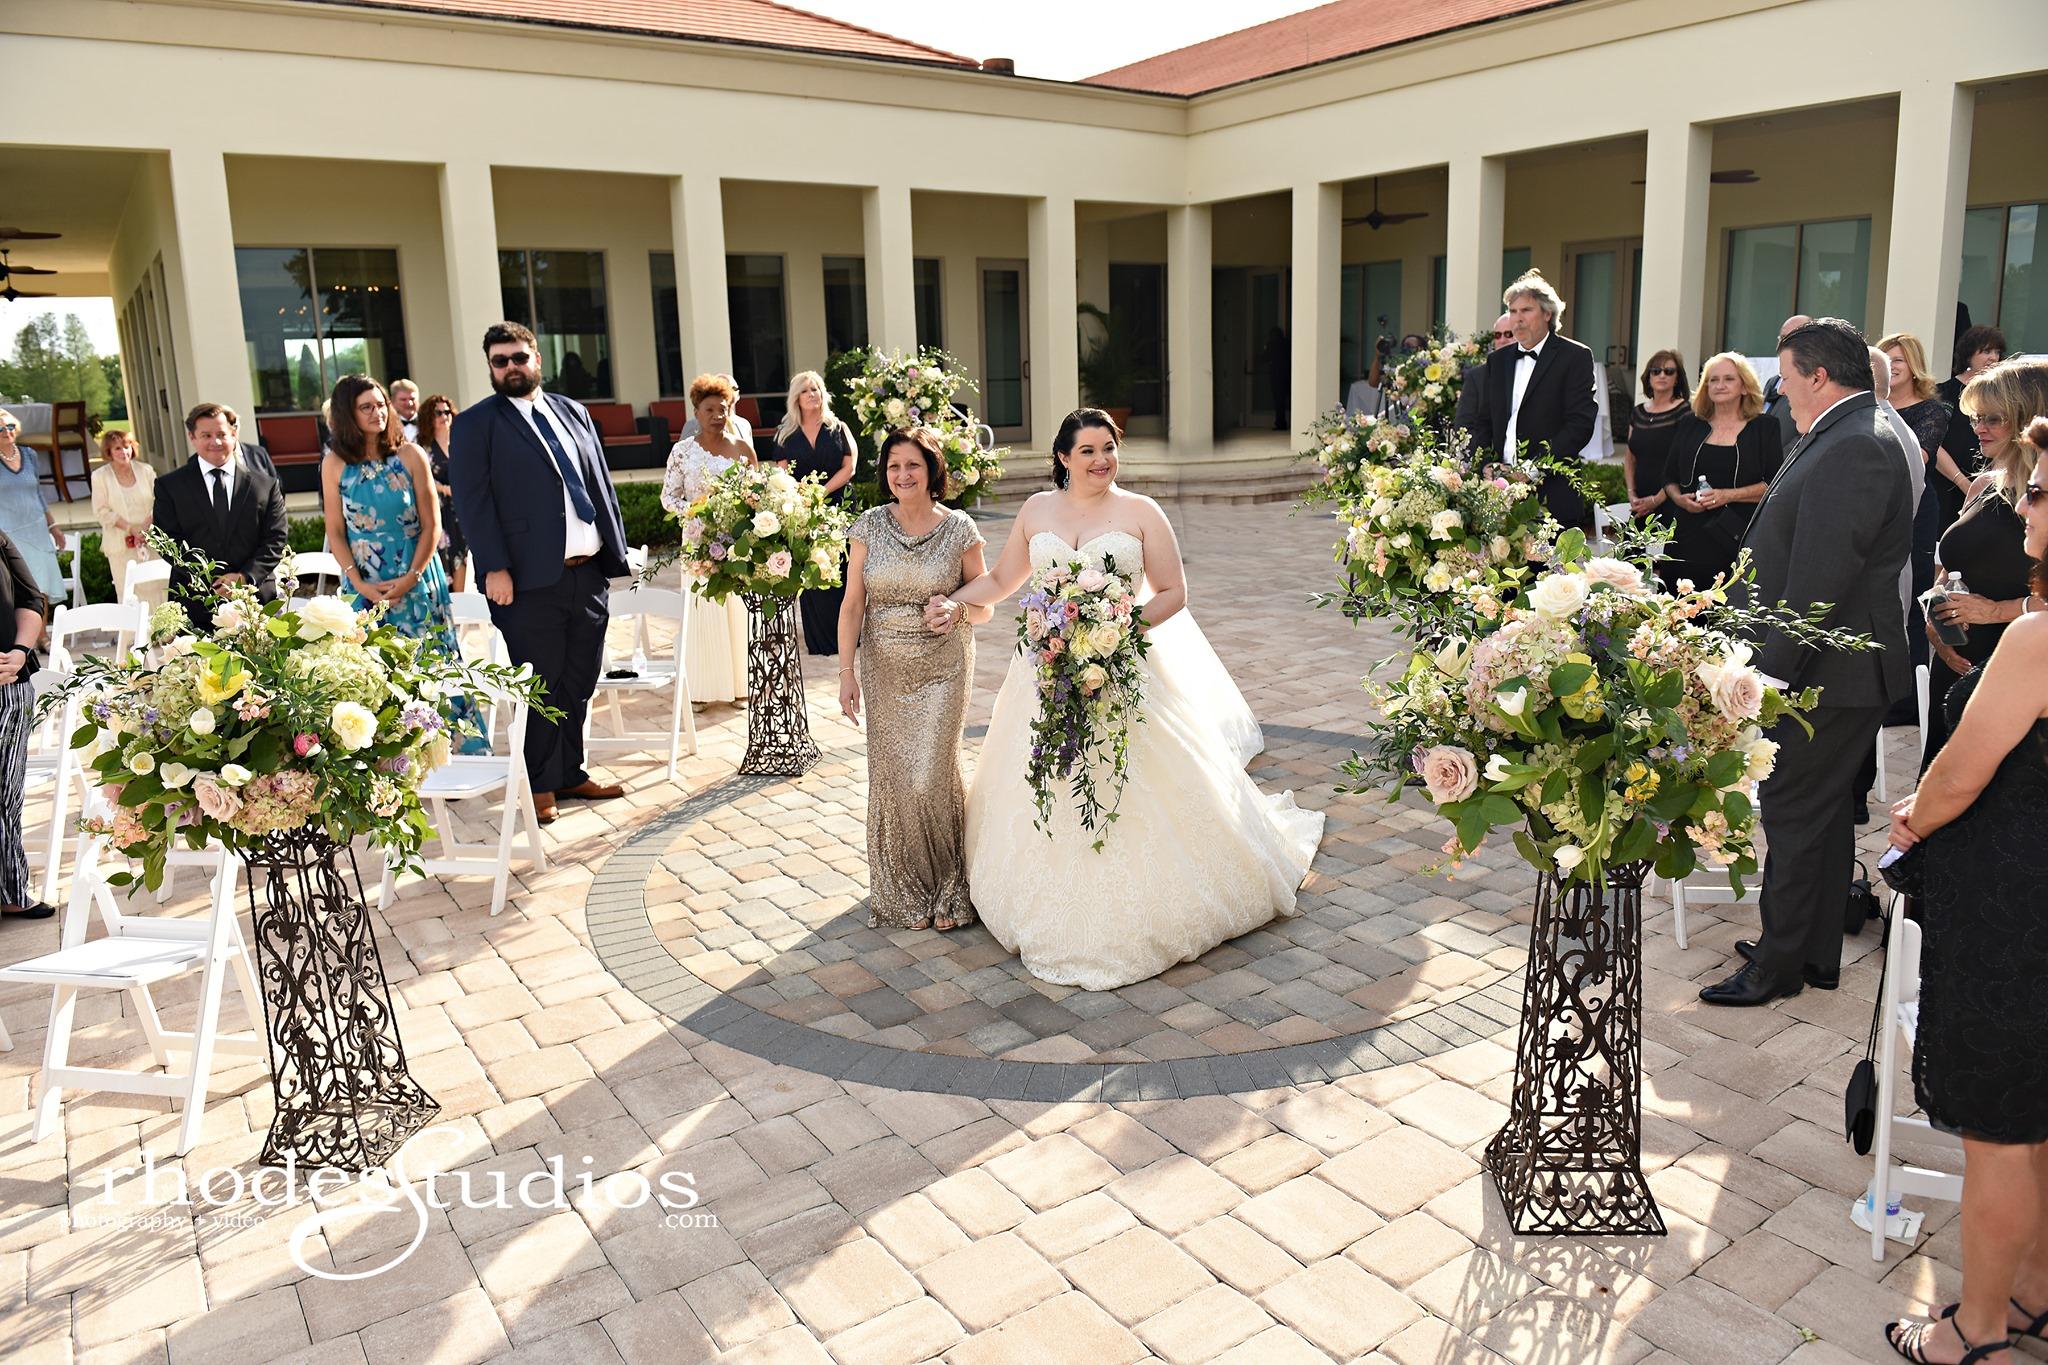 Soundwave Interlachen Country Club Central Florida Wedding First DanceSoundwave Interlachen Country Club Central Florida Wedding Ceremony